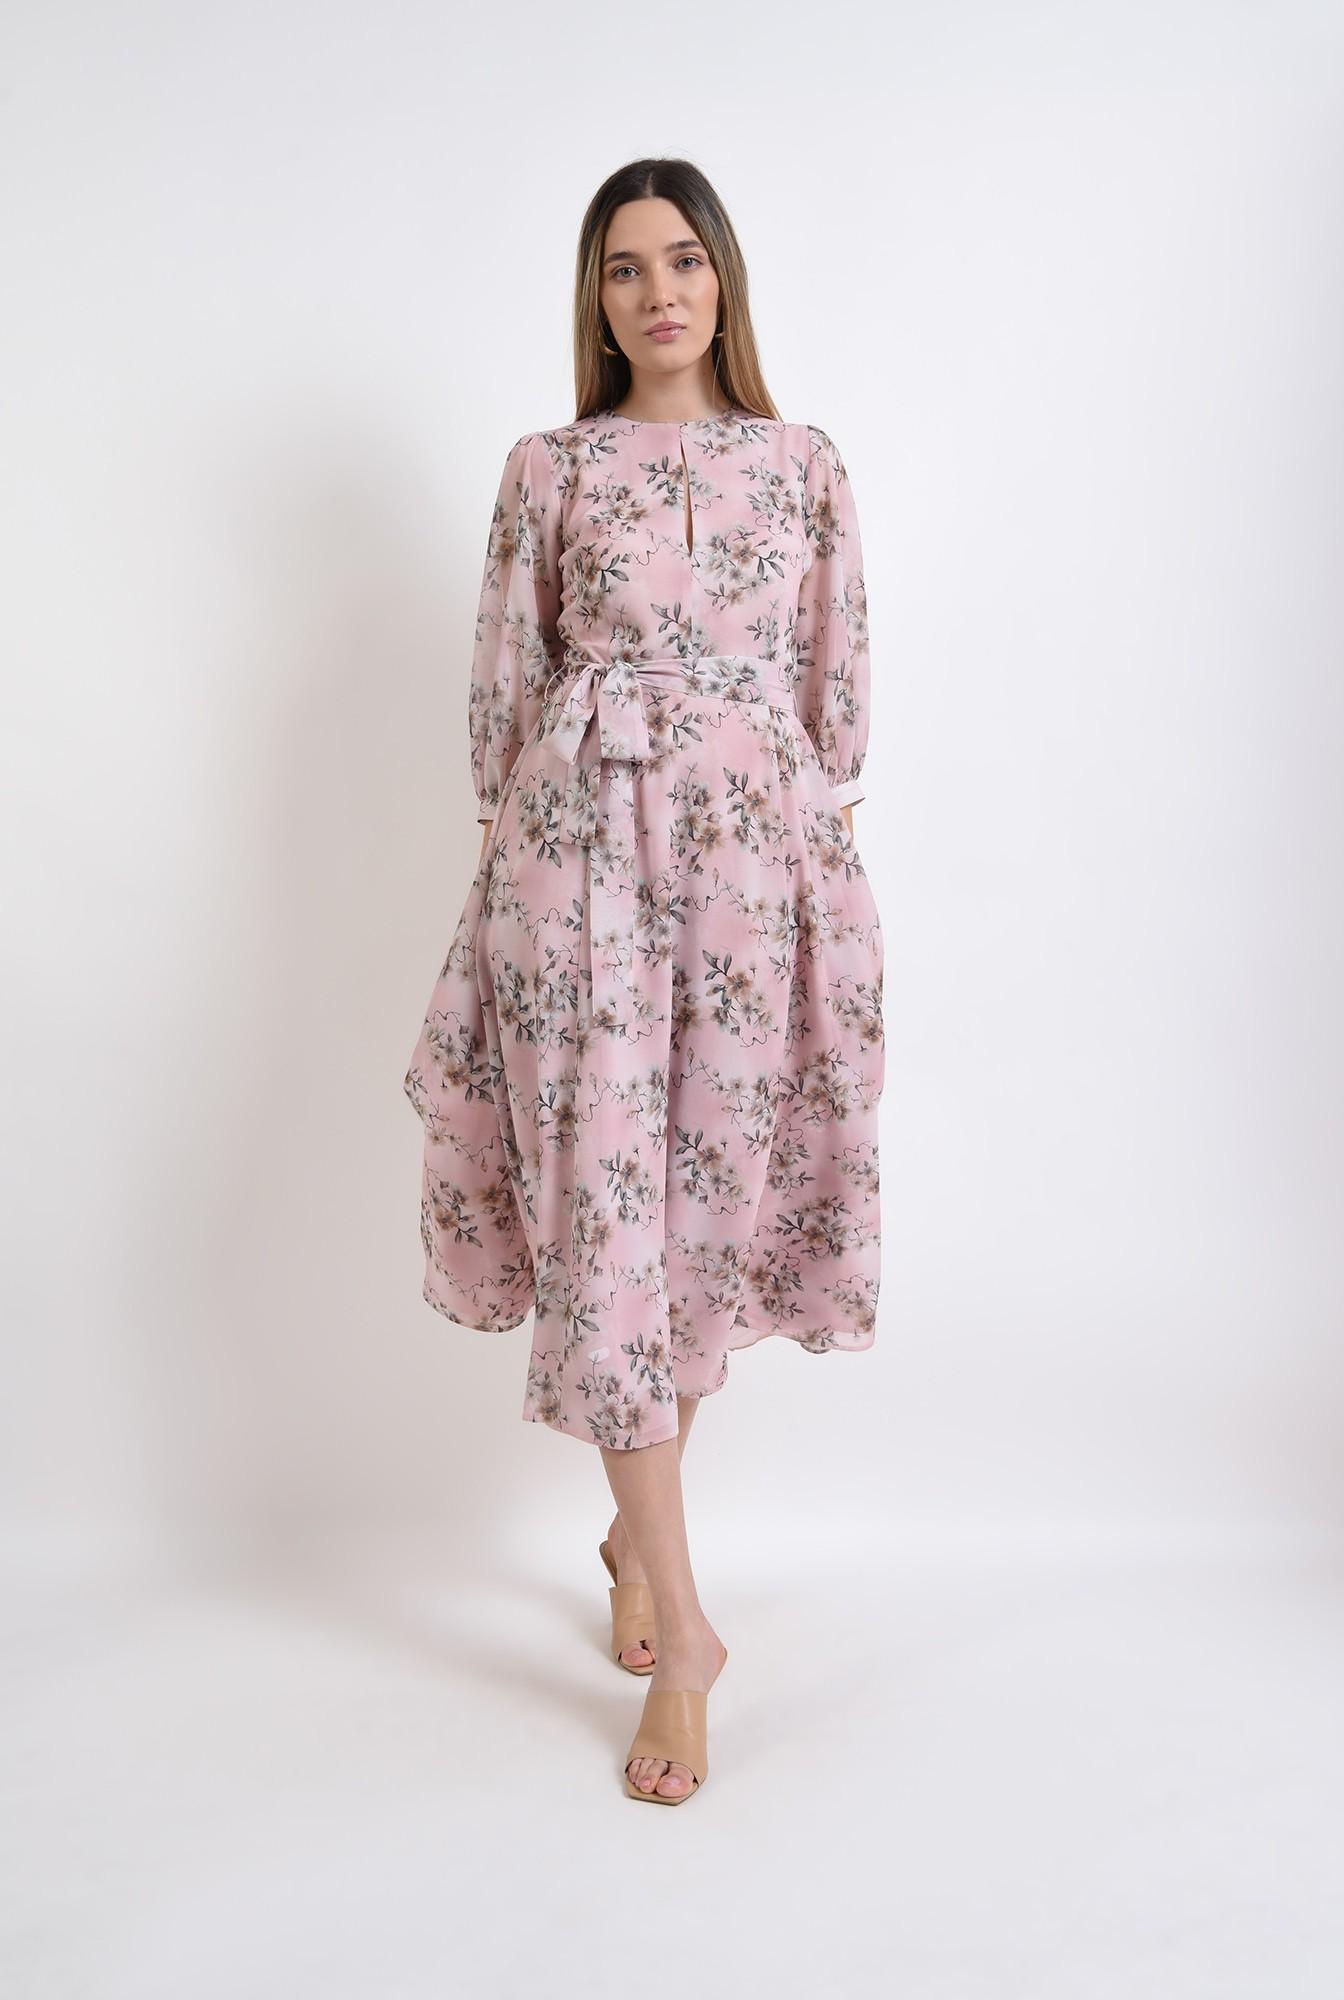 0 - rochie midi, evazata, roz, florala, eleganta